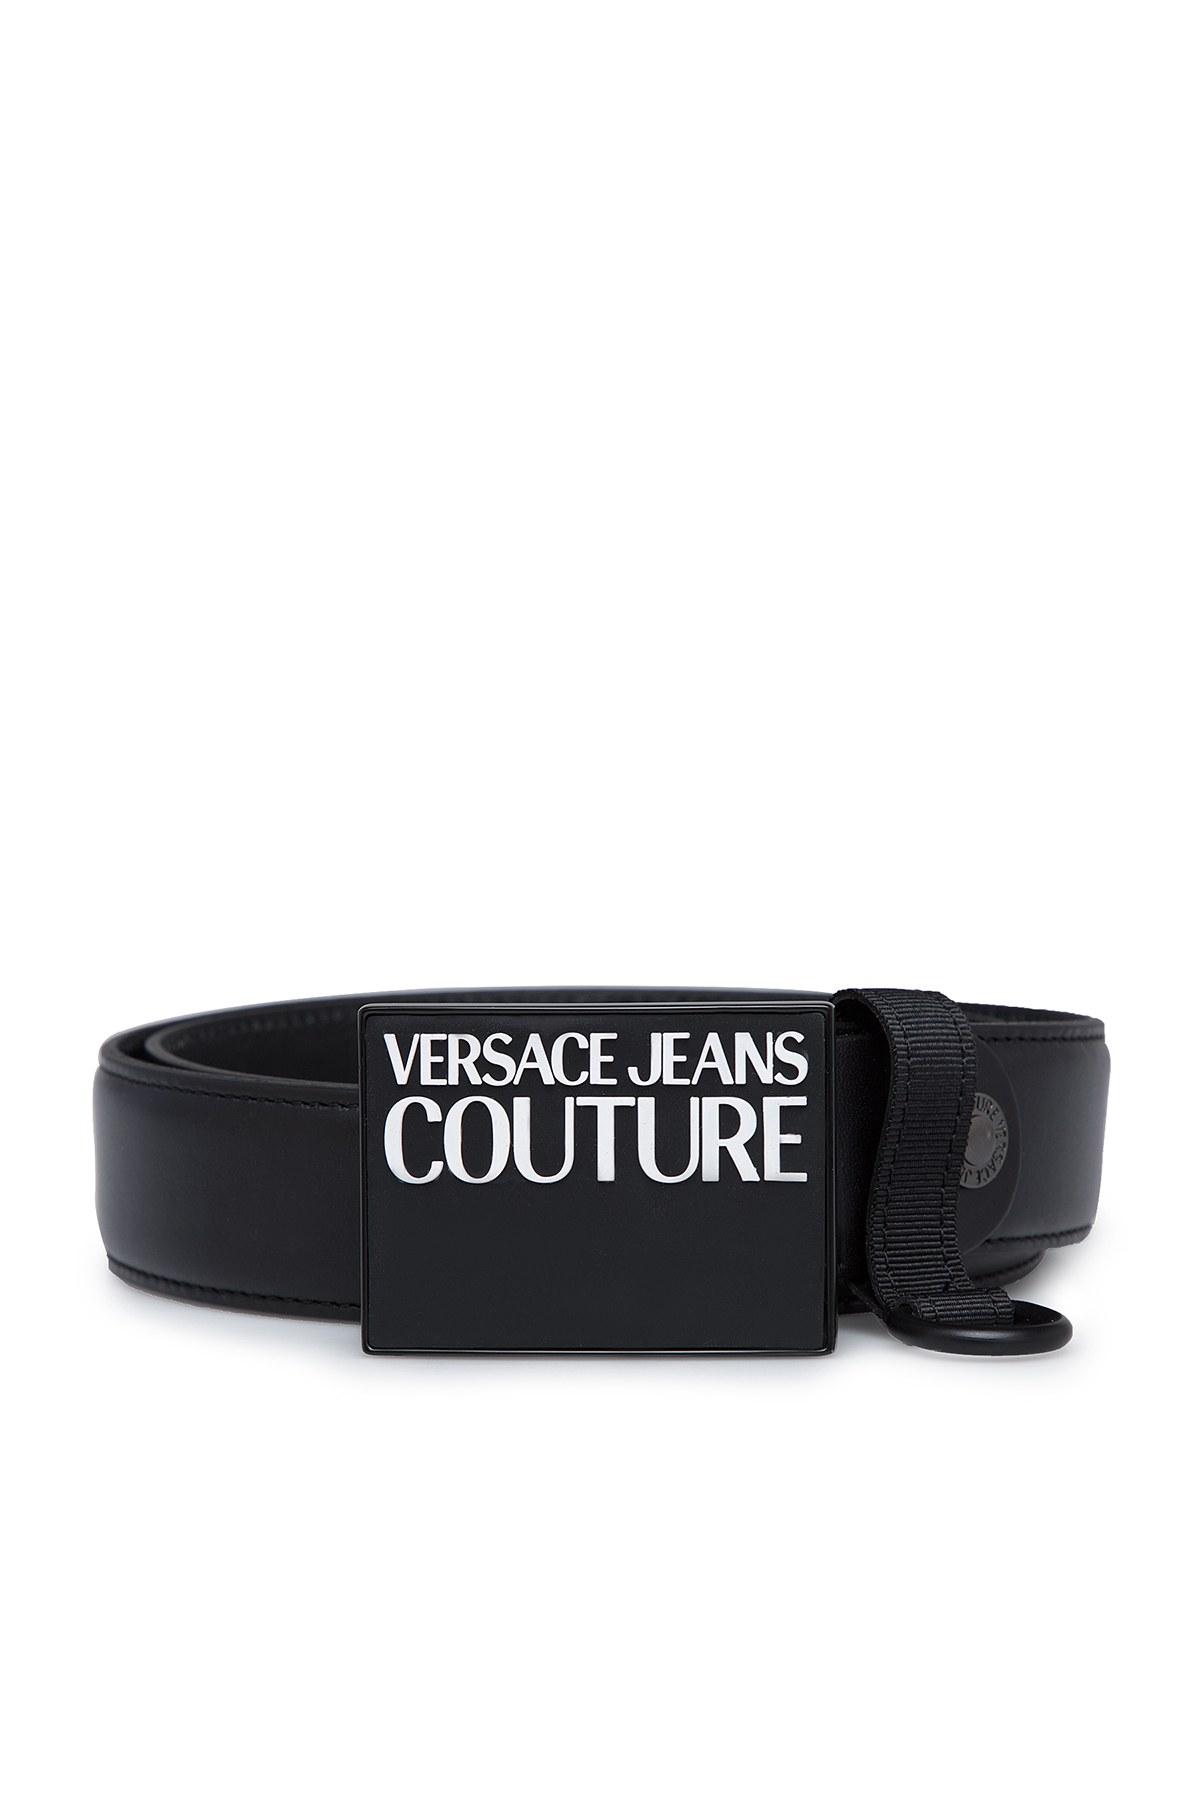 Versace Jeans Couture Erkek Kemer D8YVBF34 71450 899 SİYAH